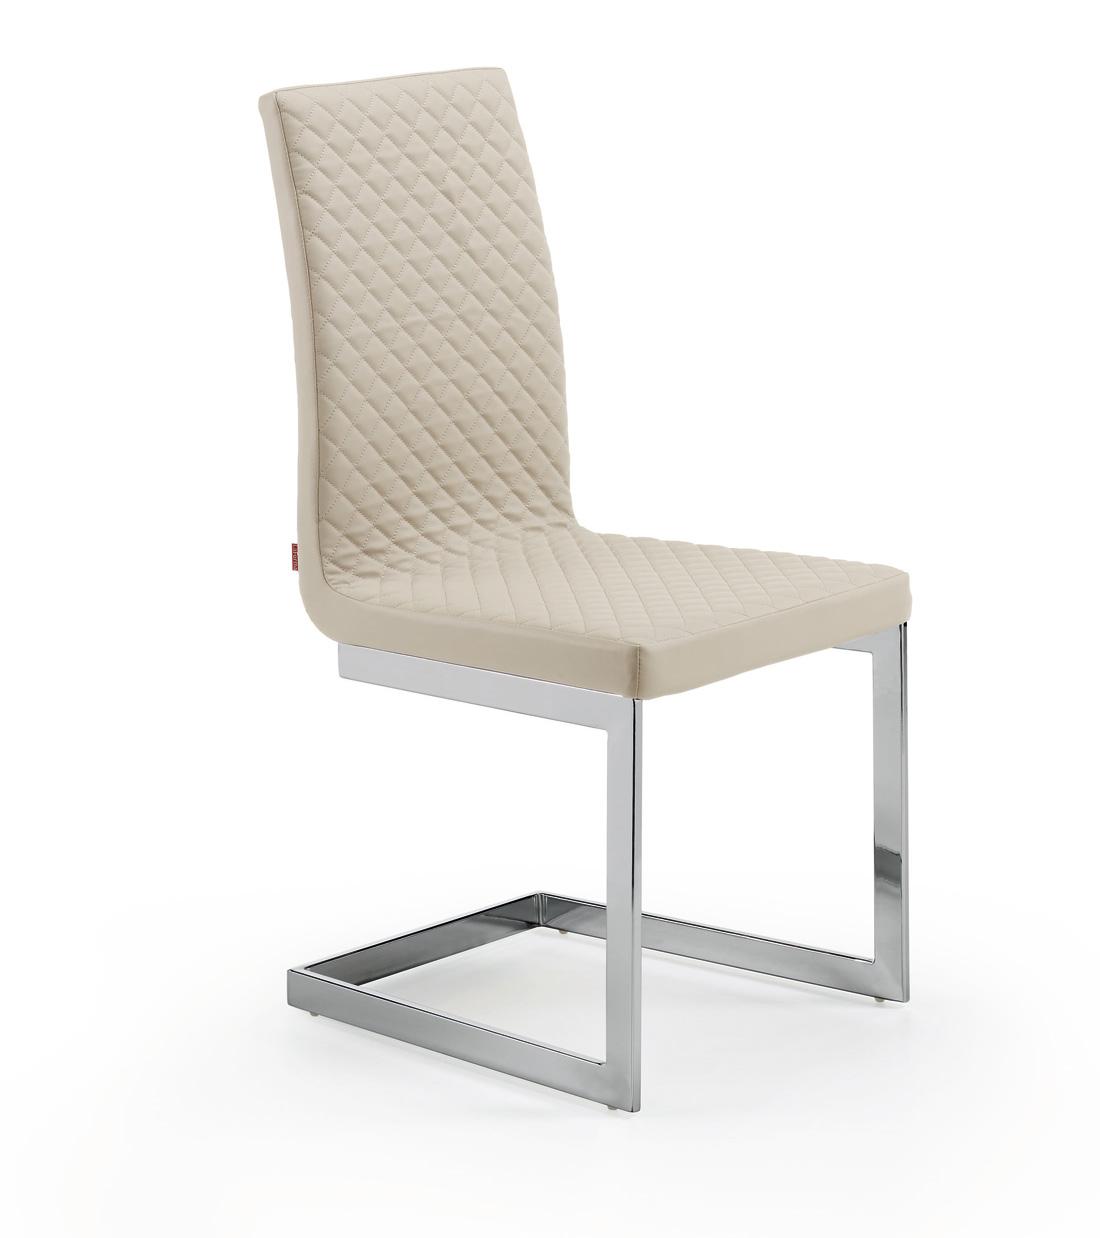 Sillas modelo kedin patas cromadas curvas muebles de for Sillas cromadas